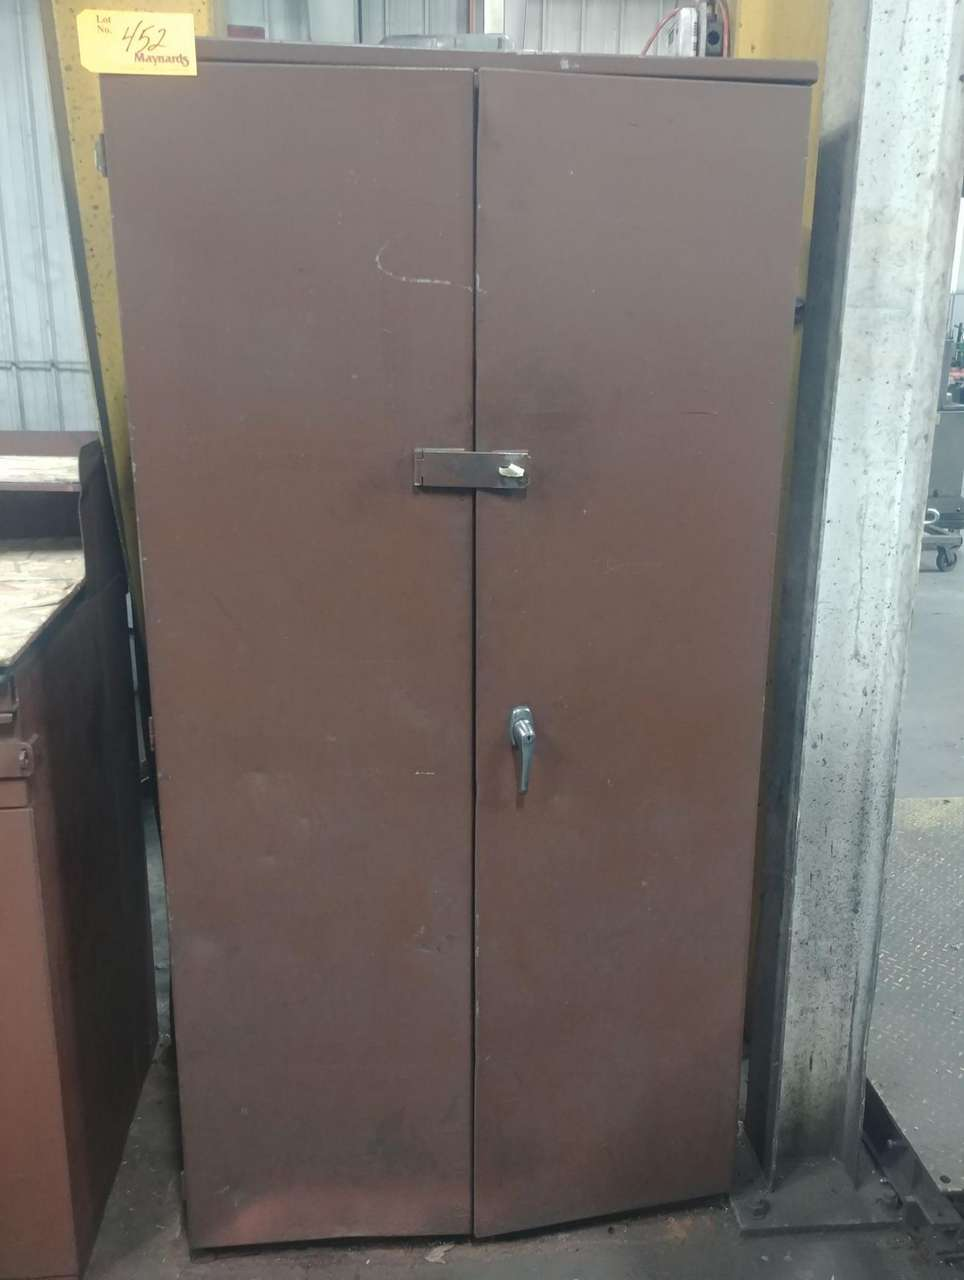 L&L Machine Tool, Inc - Large Capacity Turning and Boring Facility